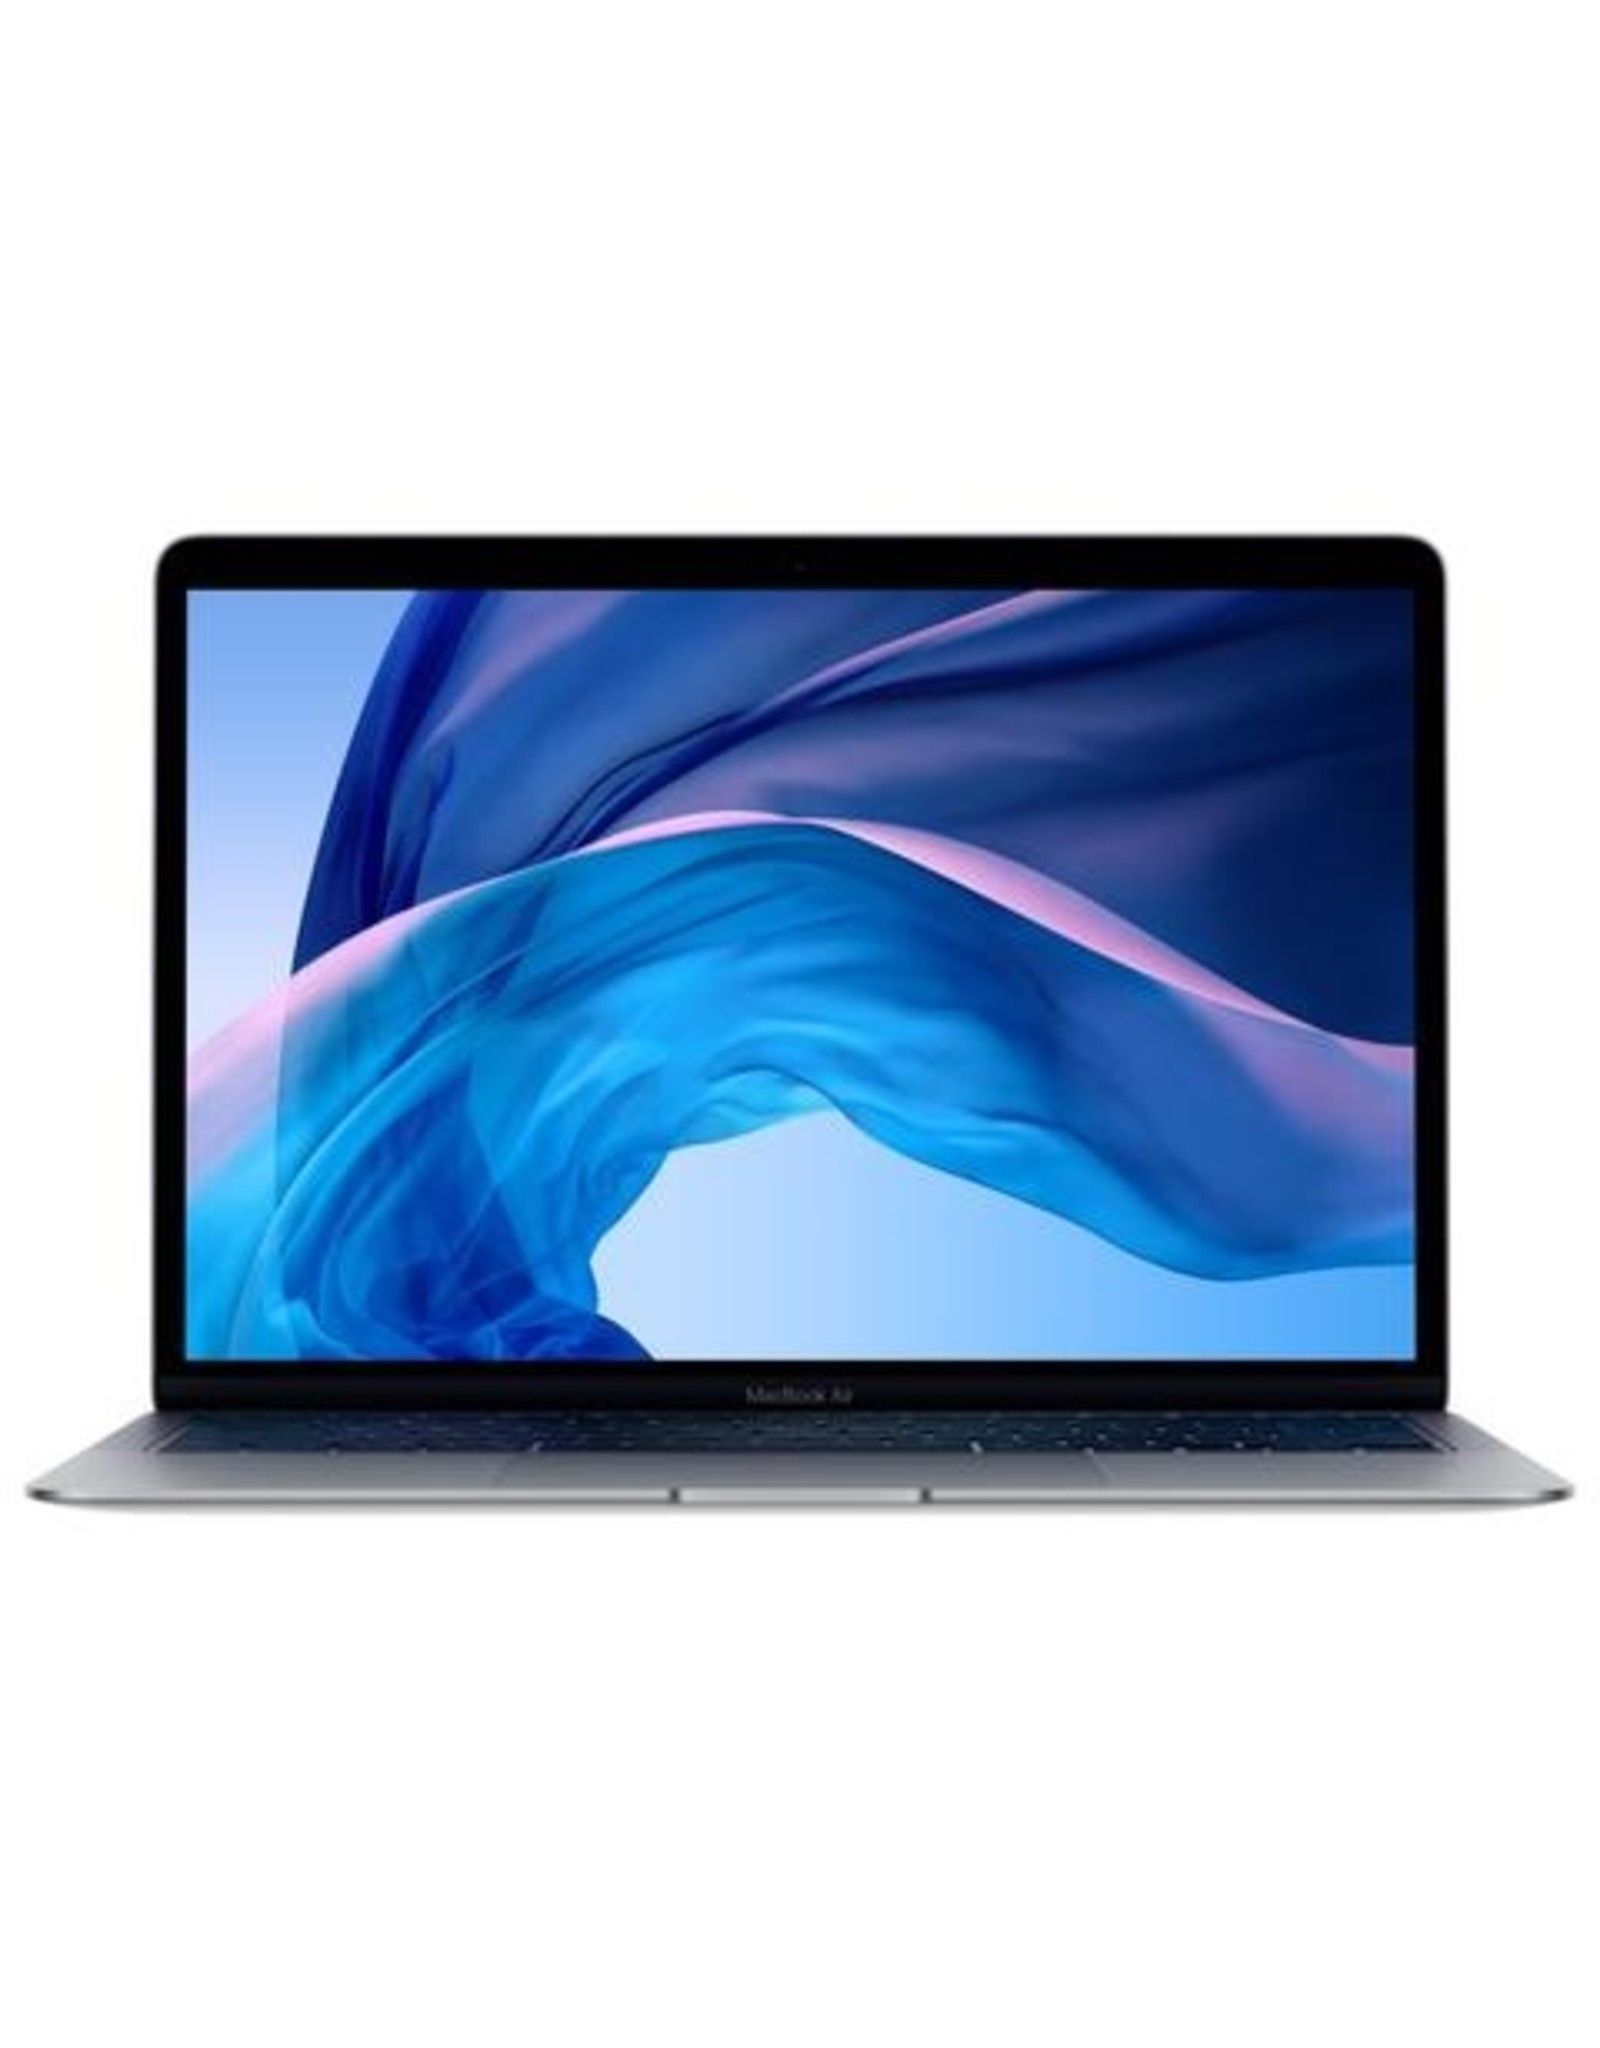 Apple Macbook Air 13 inch GREY 256gb 2020